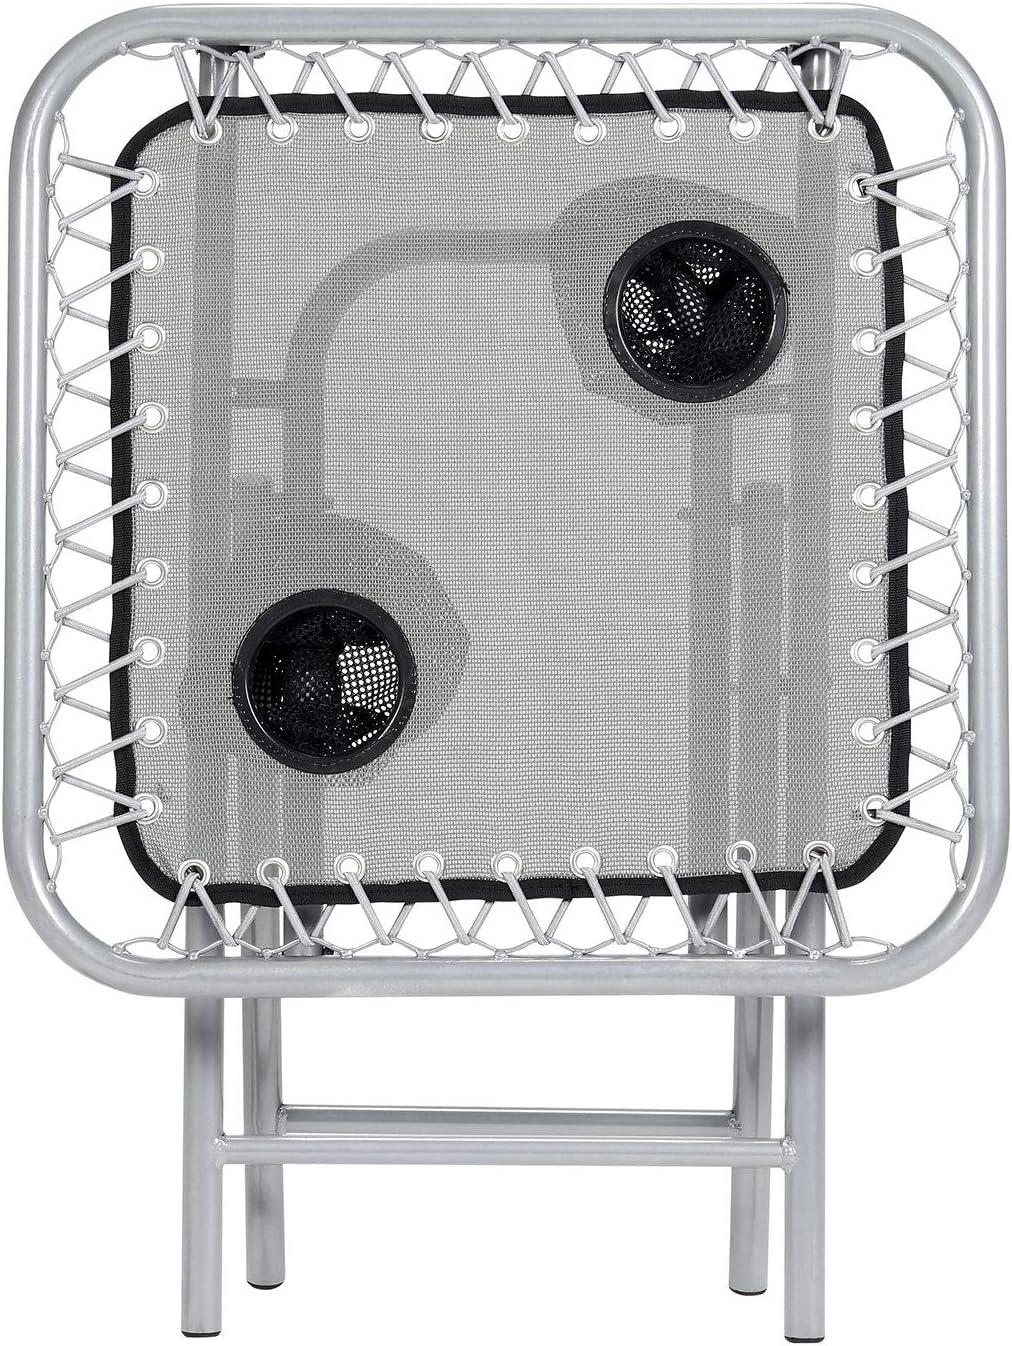 Black Parkland/® Folding Outdoor Steel Frame Garden Patio Drinks Side Table with Drinks Holder for Zero Gravity Sun Lounger